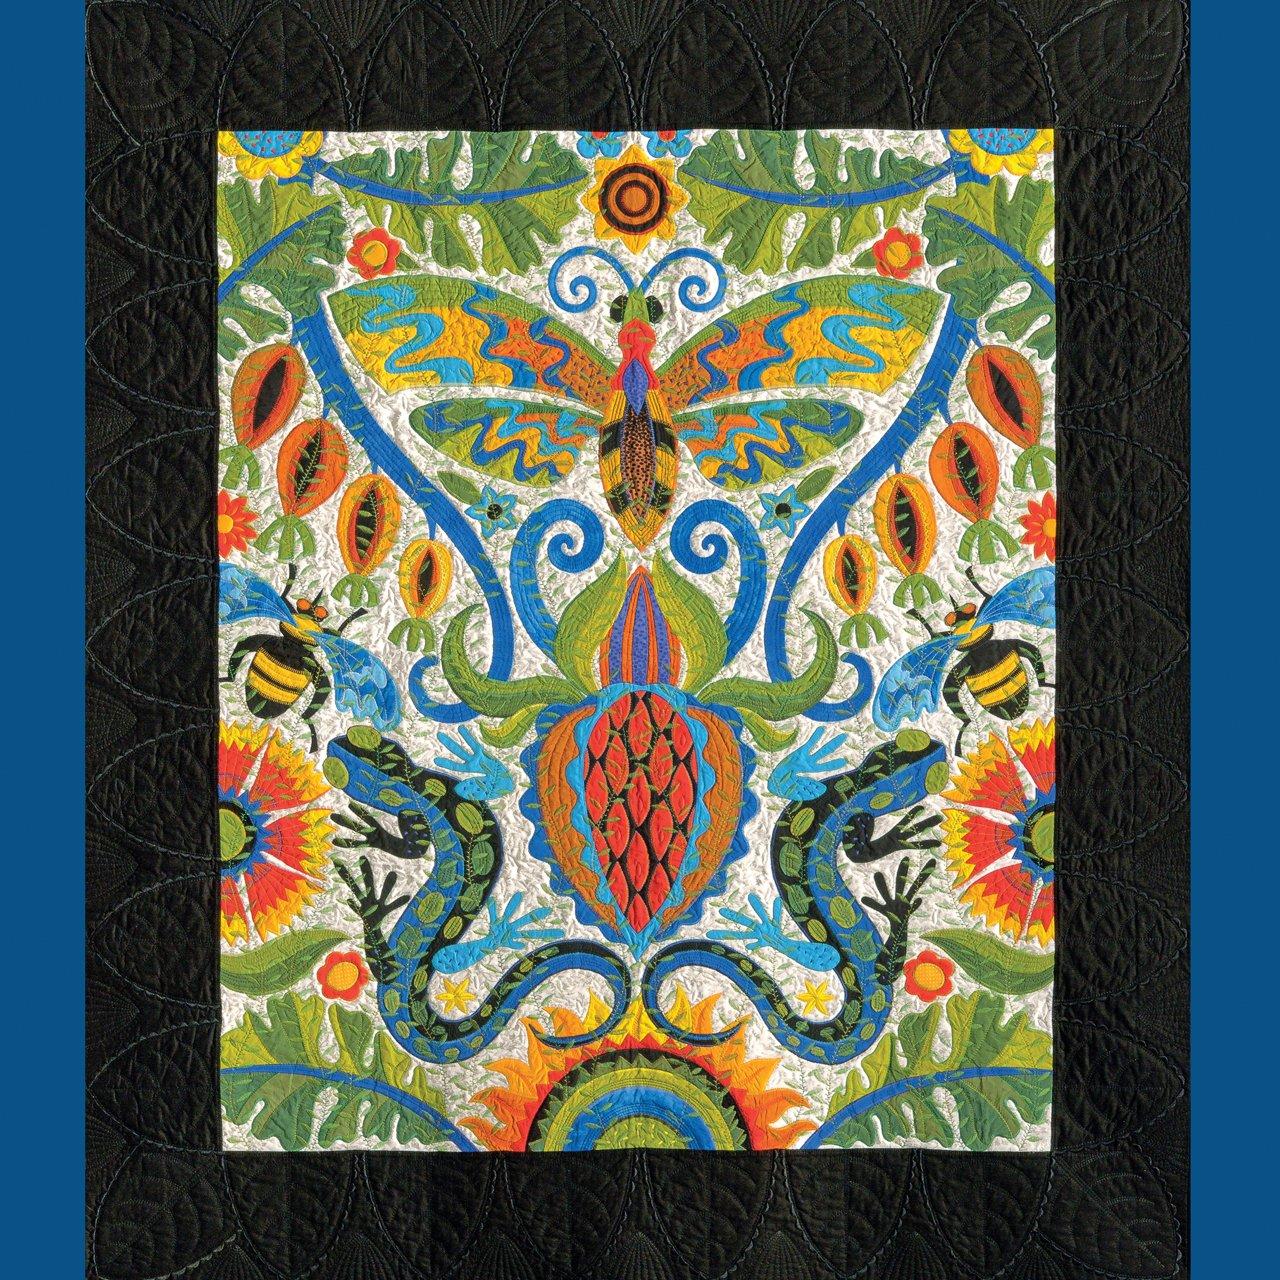 Award-Winning Quilts 2015 Calendar: Featuring Quilts from the International  Quilt Association: That Patchwork Place: 0744527701438: Amazon.com: Books